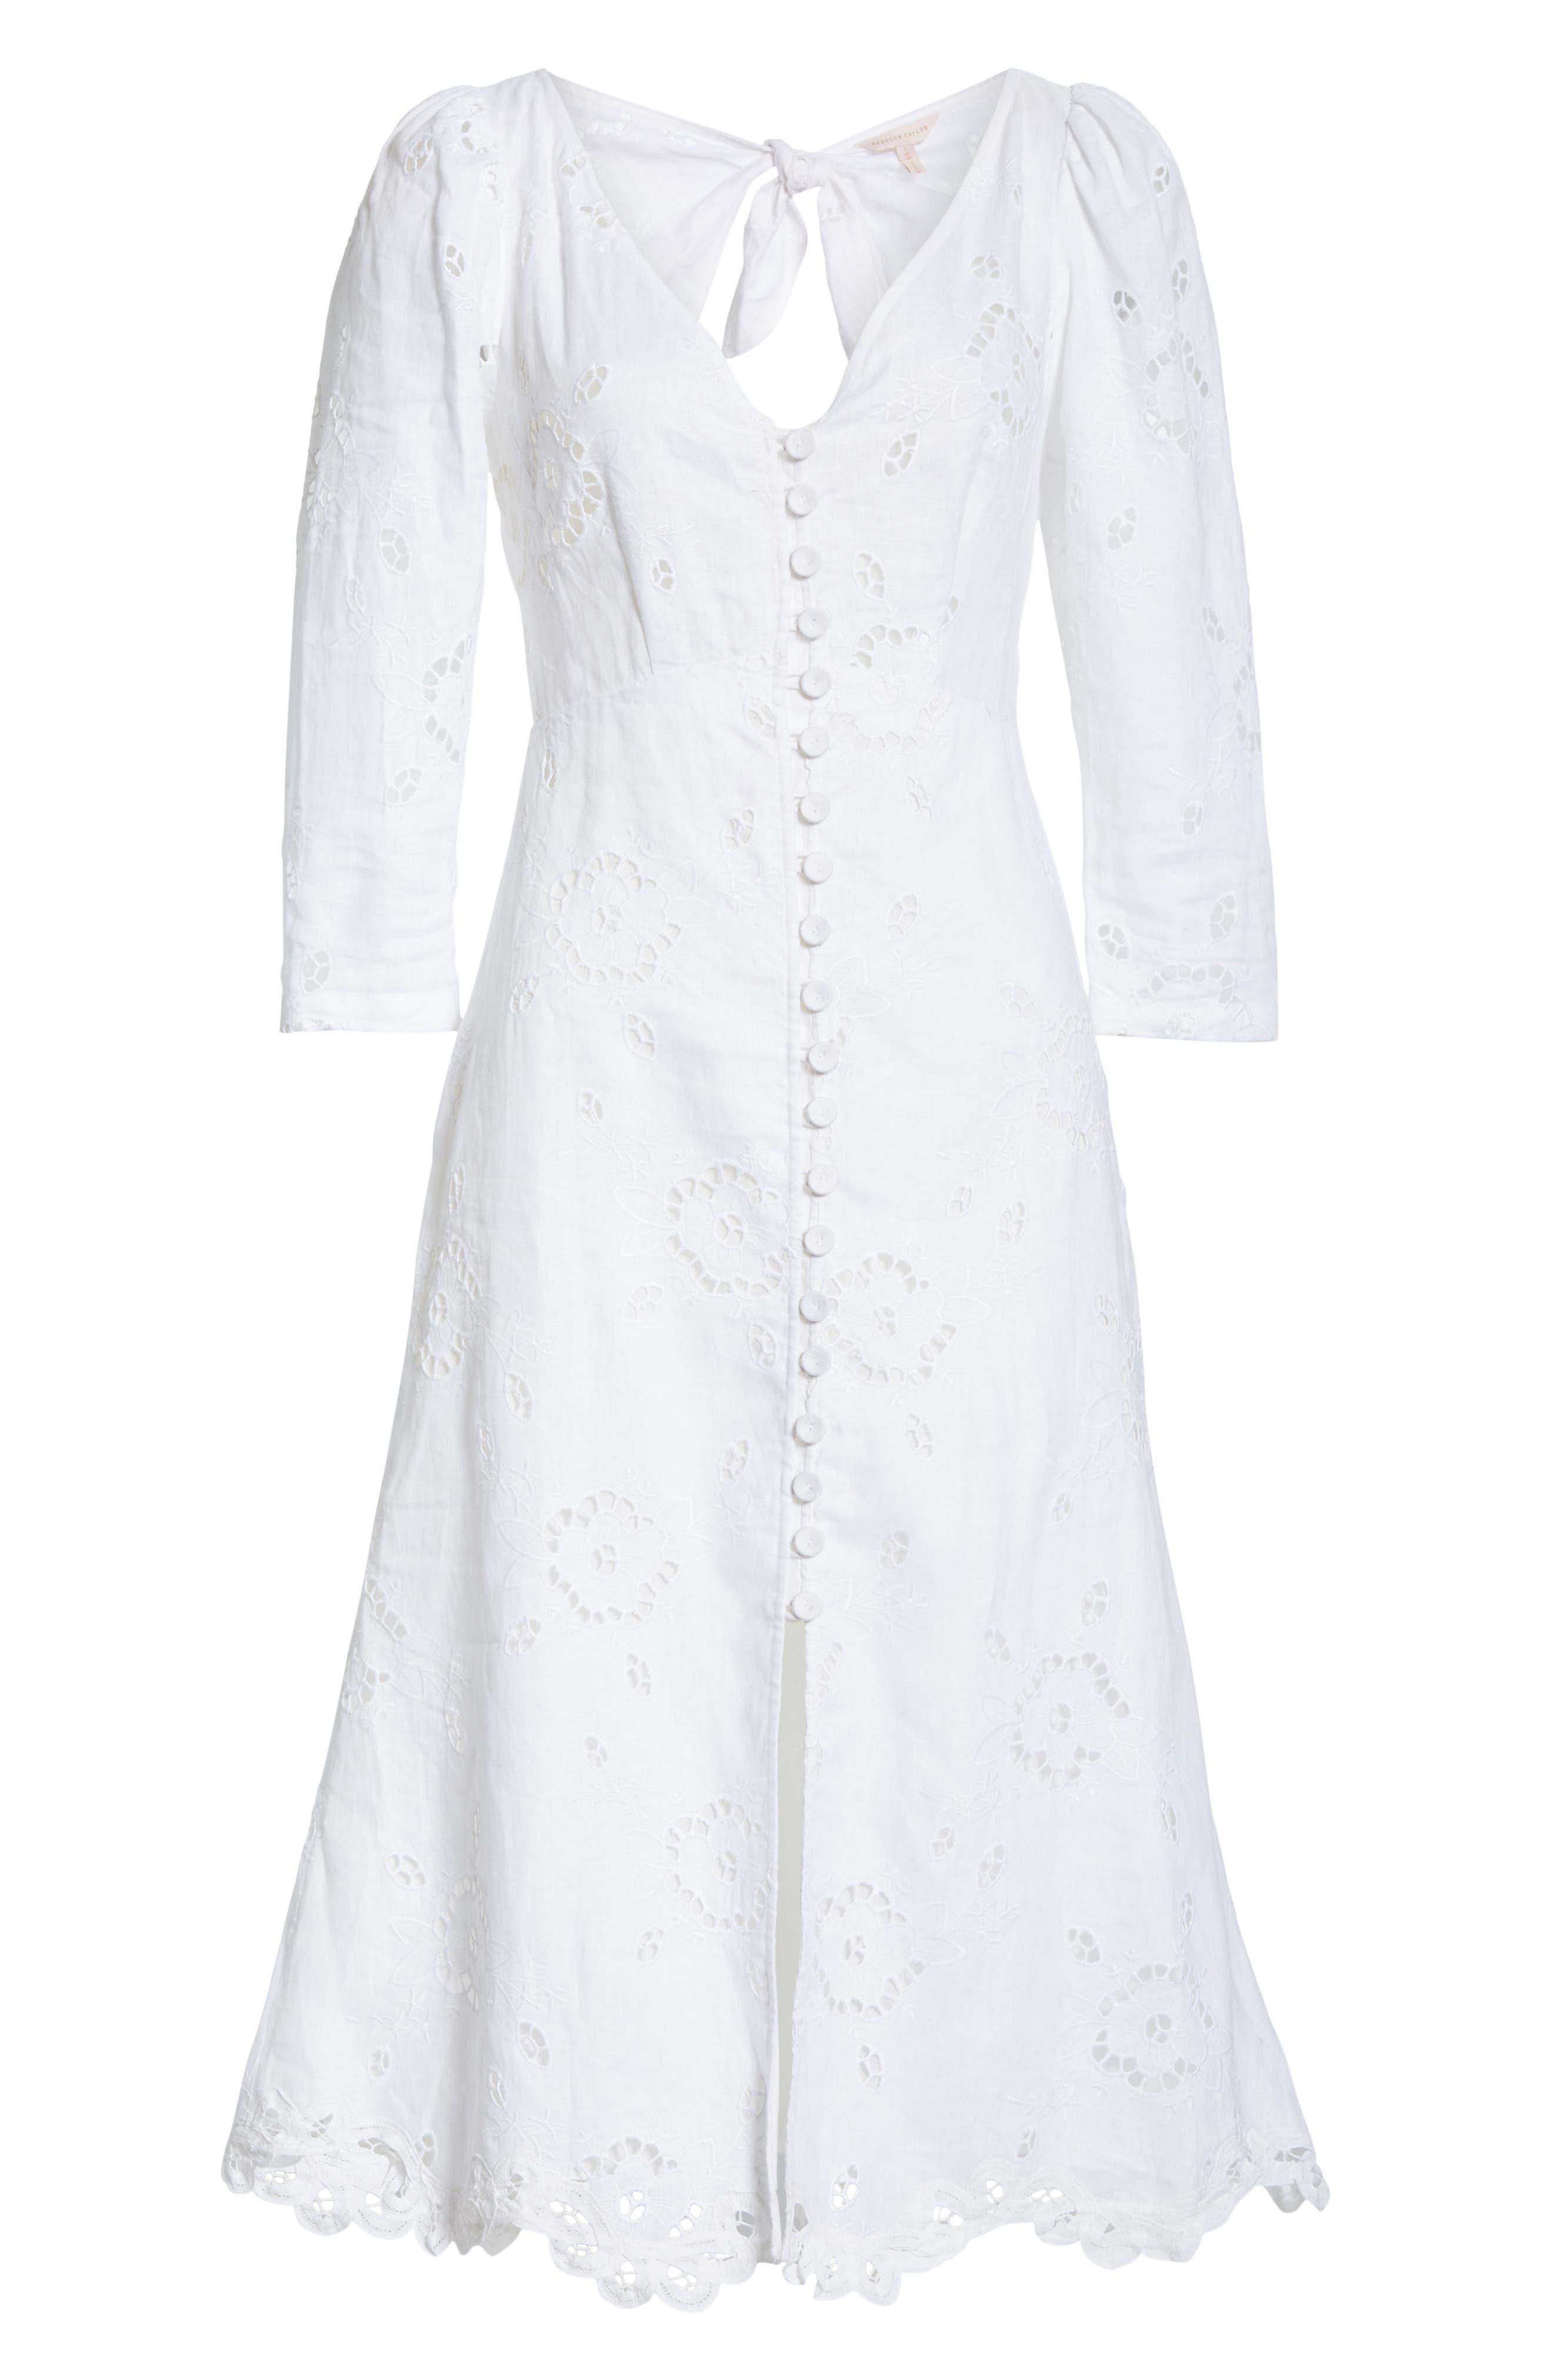 REBECCA TAYLOR,                             Terri Embroidered A-Line Dress,                             Alternate thumbnail 6, color,                             MILK